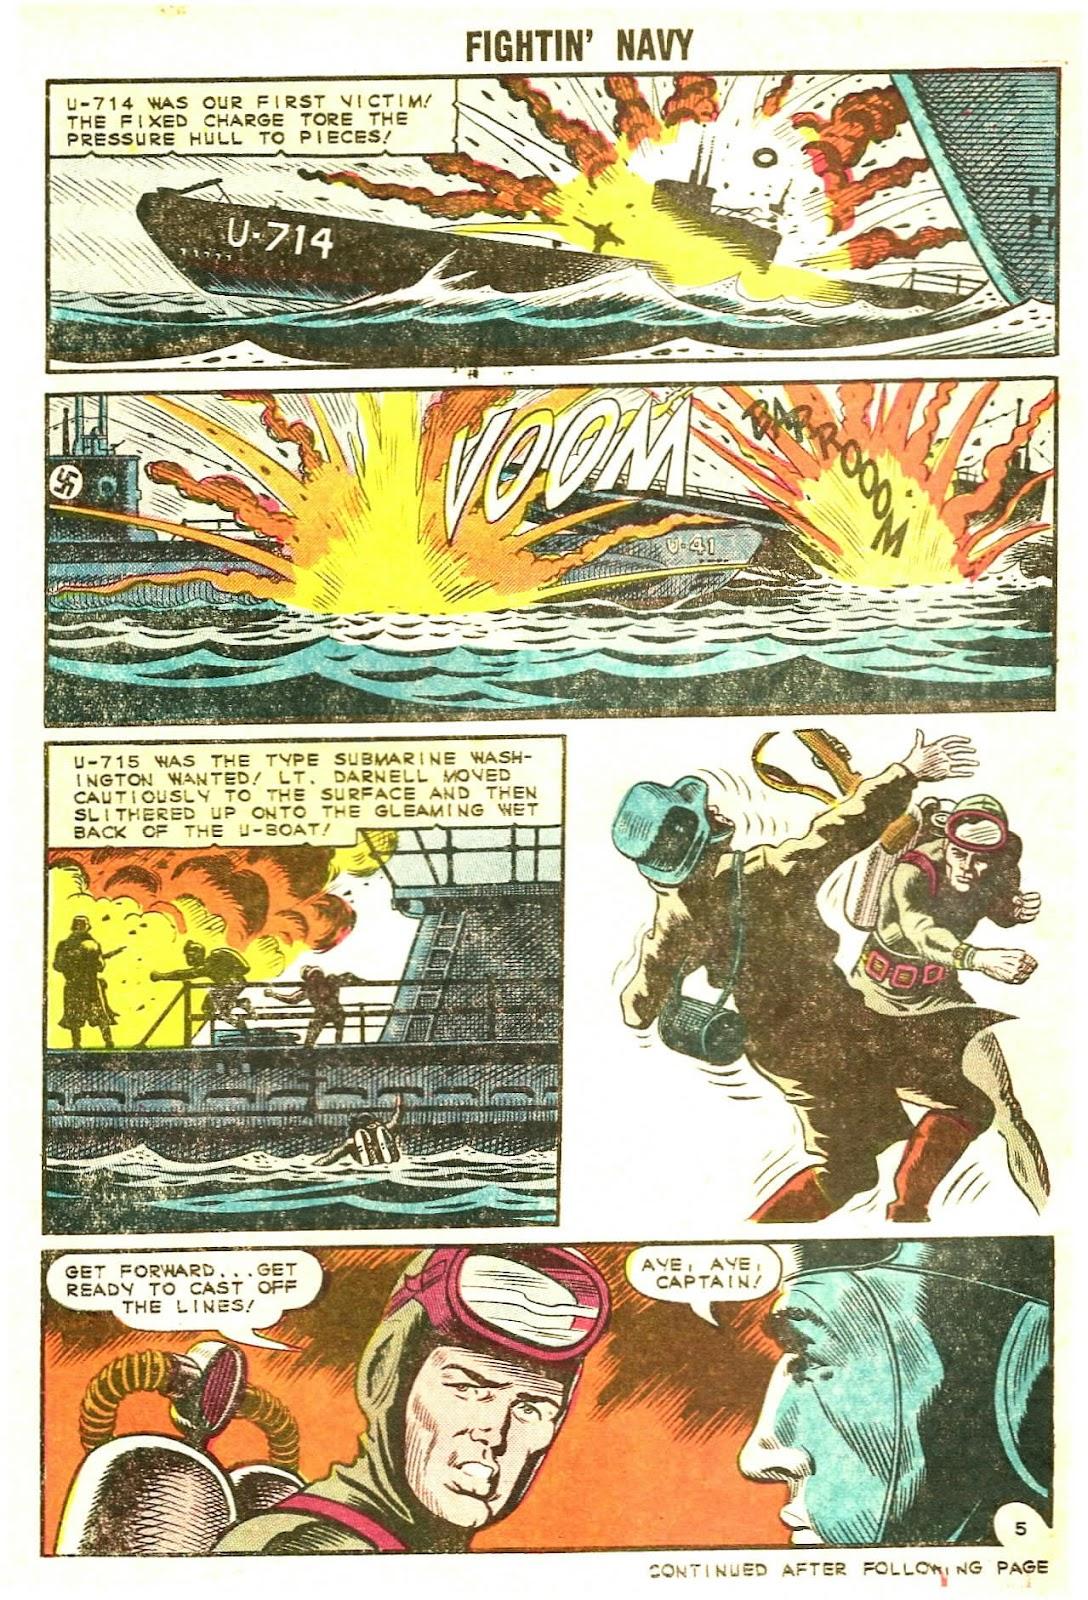 Read online Fightin' Navy comic -  Issue #120 - 30